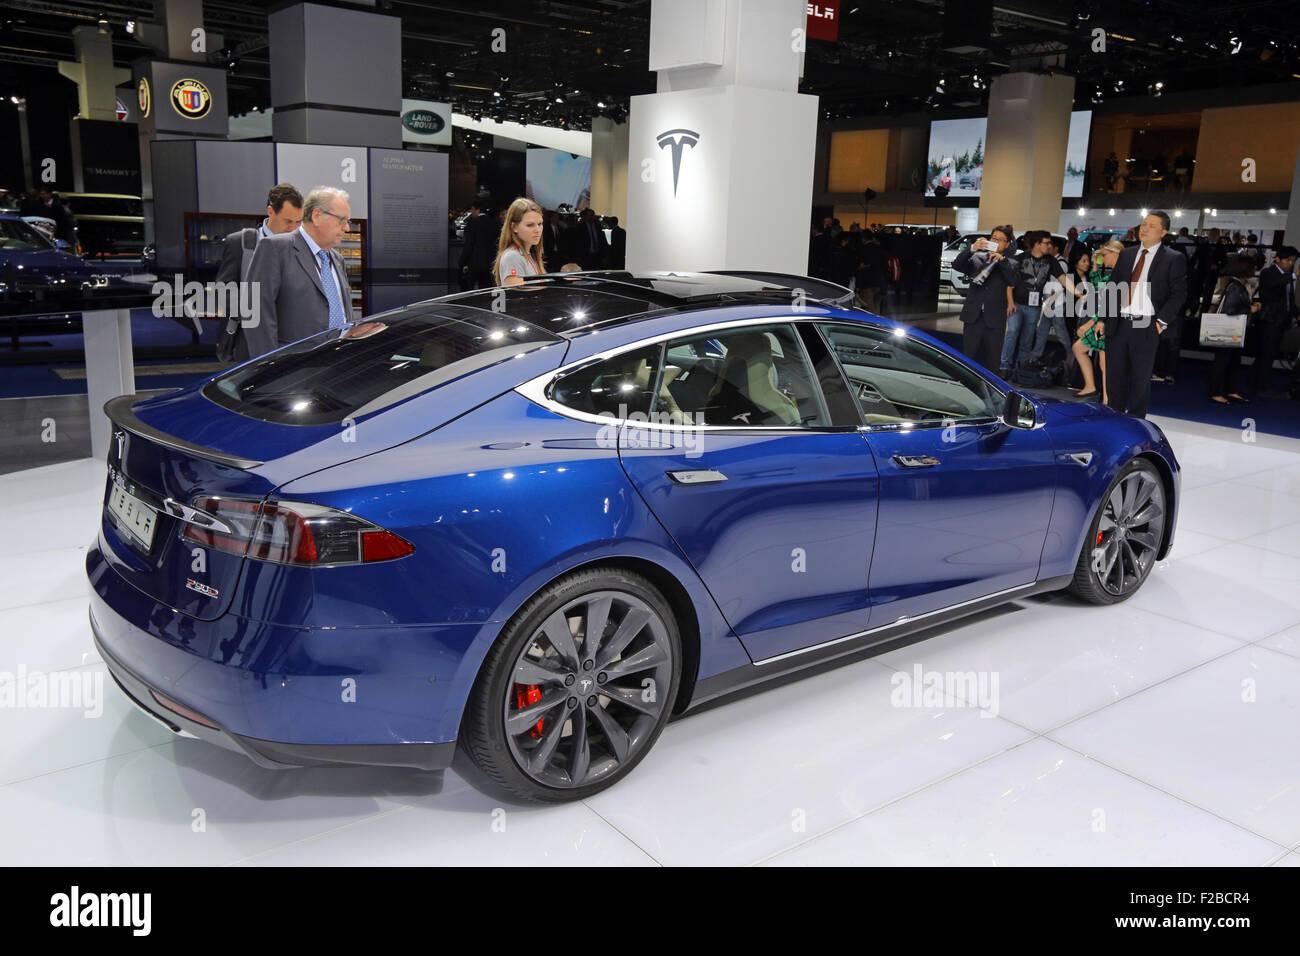 TESLA Model S At The Th International Motor Show IAA Stock - Automobil tesla